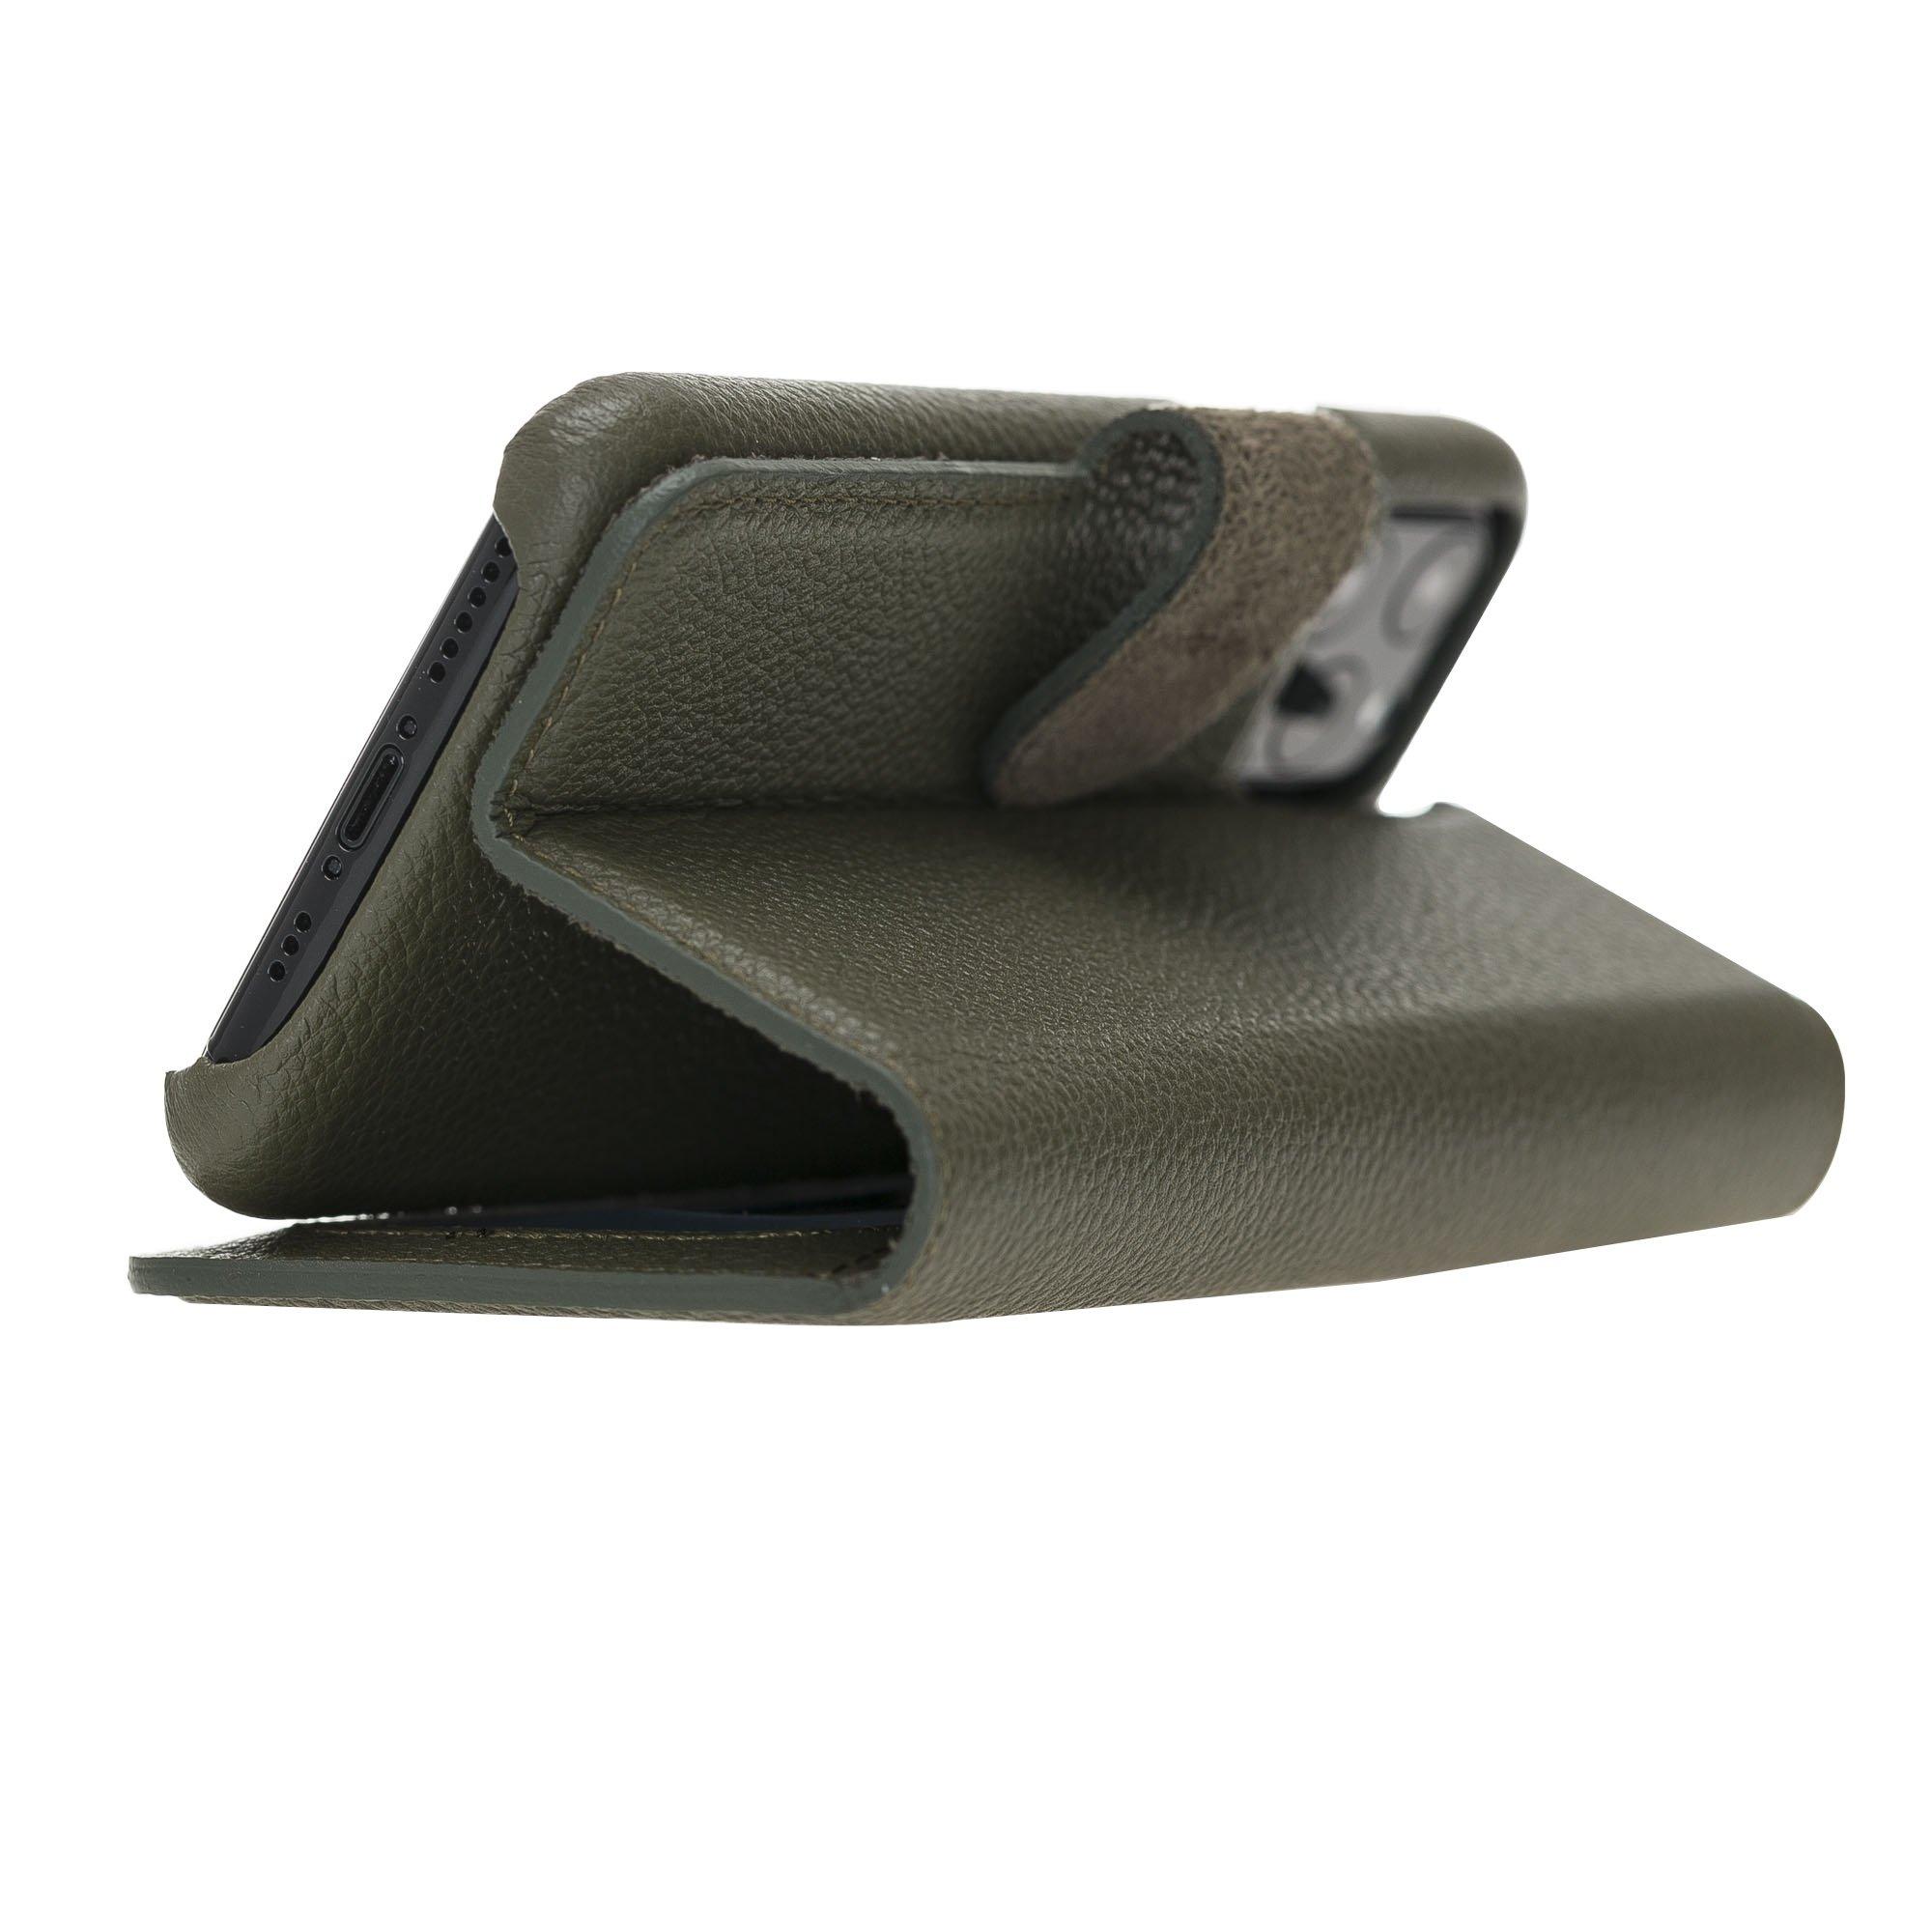 Solo Pelle Lederhülle kompatibel für iPhone 11 Pro in 5.8 Zoll abnehmbare Hülle Harvard (2in1) (Vollleder Nachtgrün)